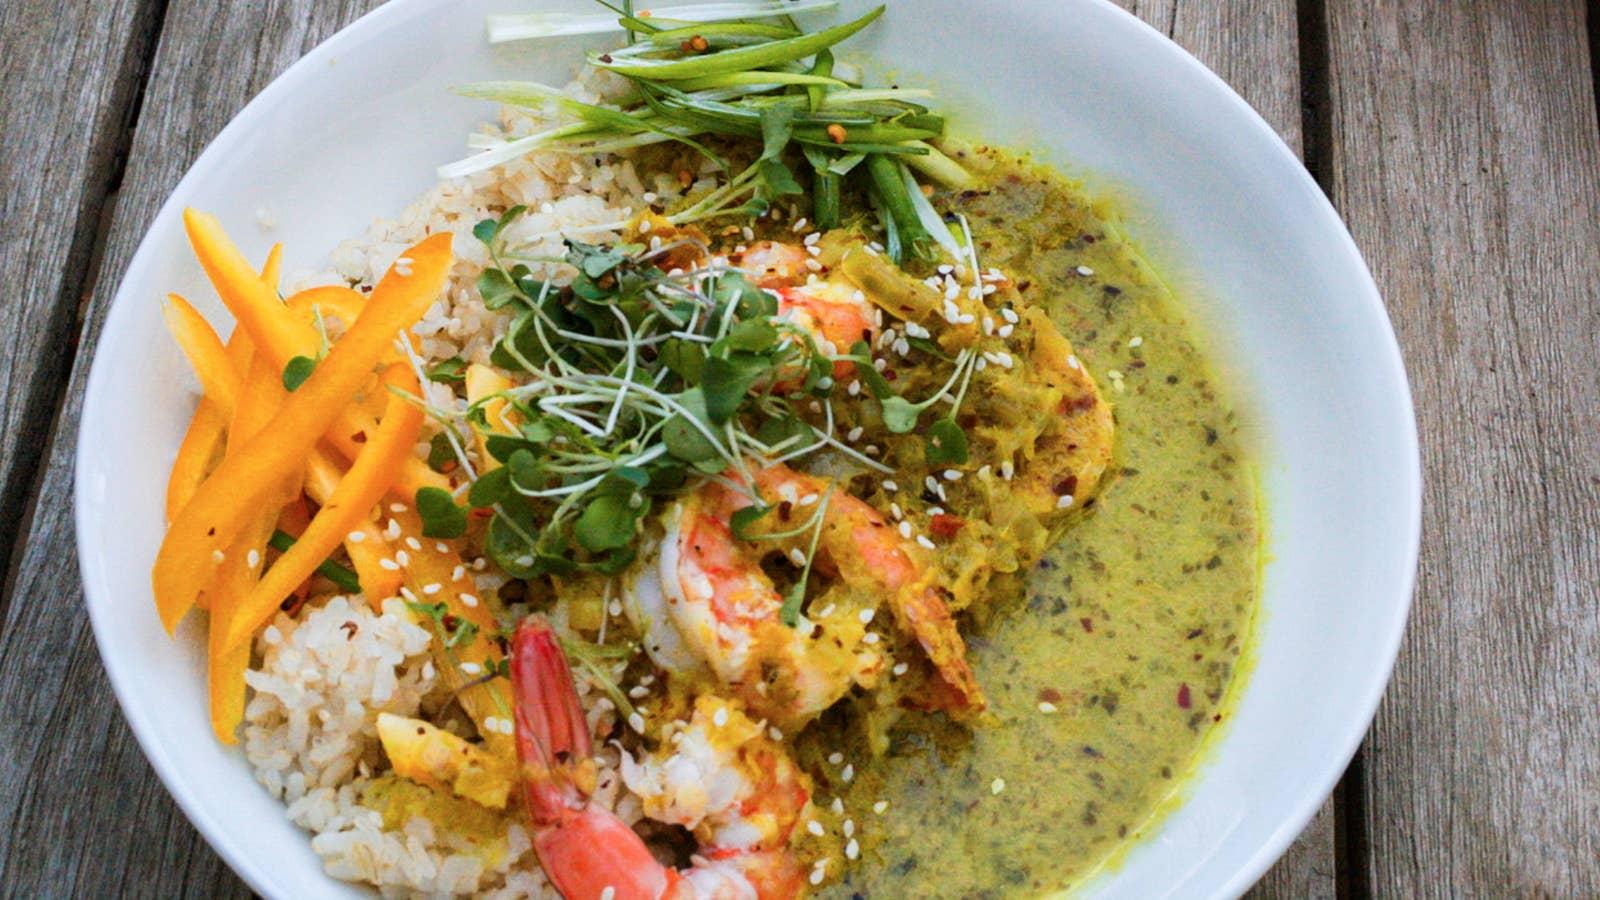 Basil Lemongrass Curry